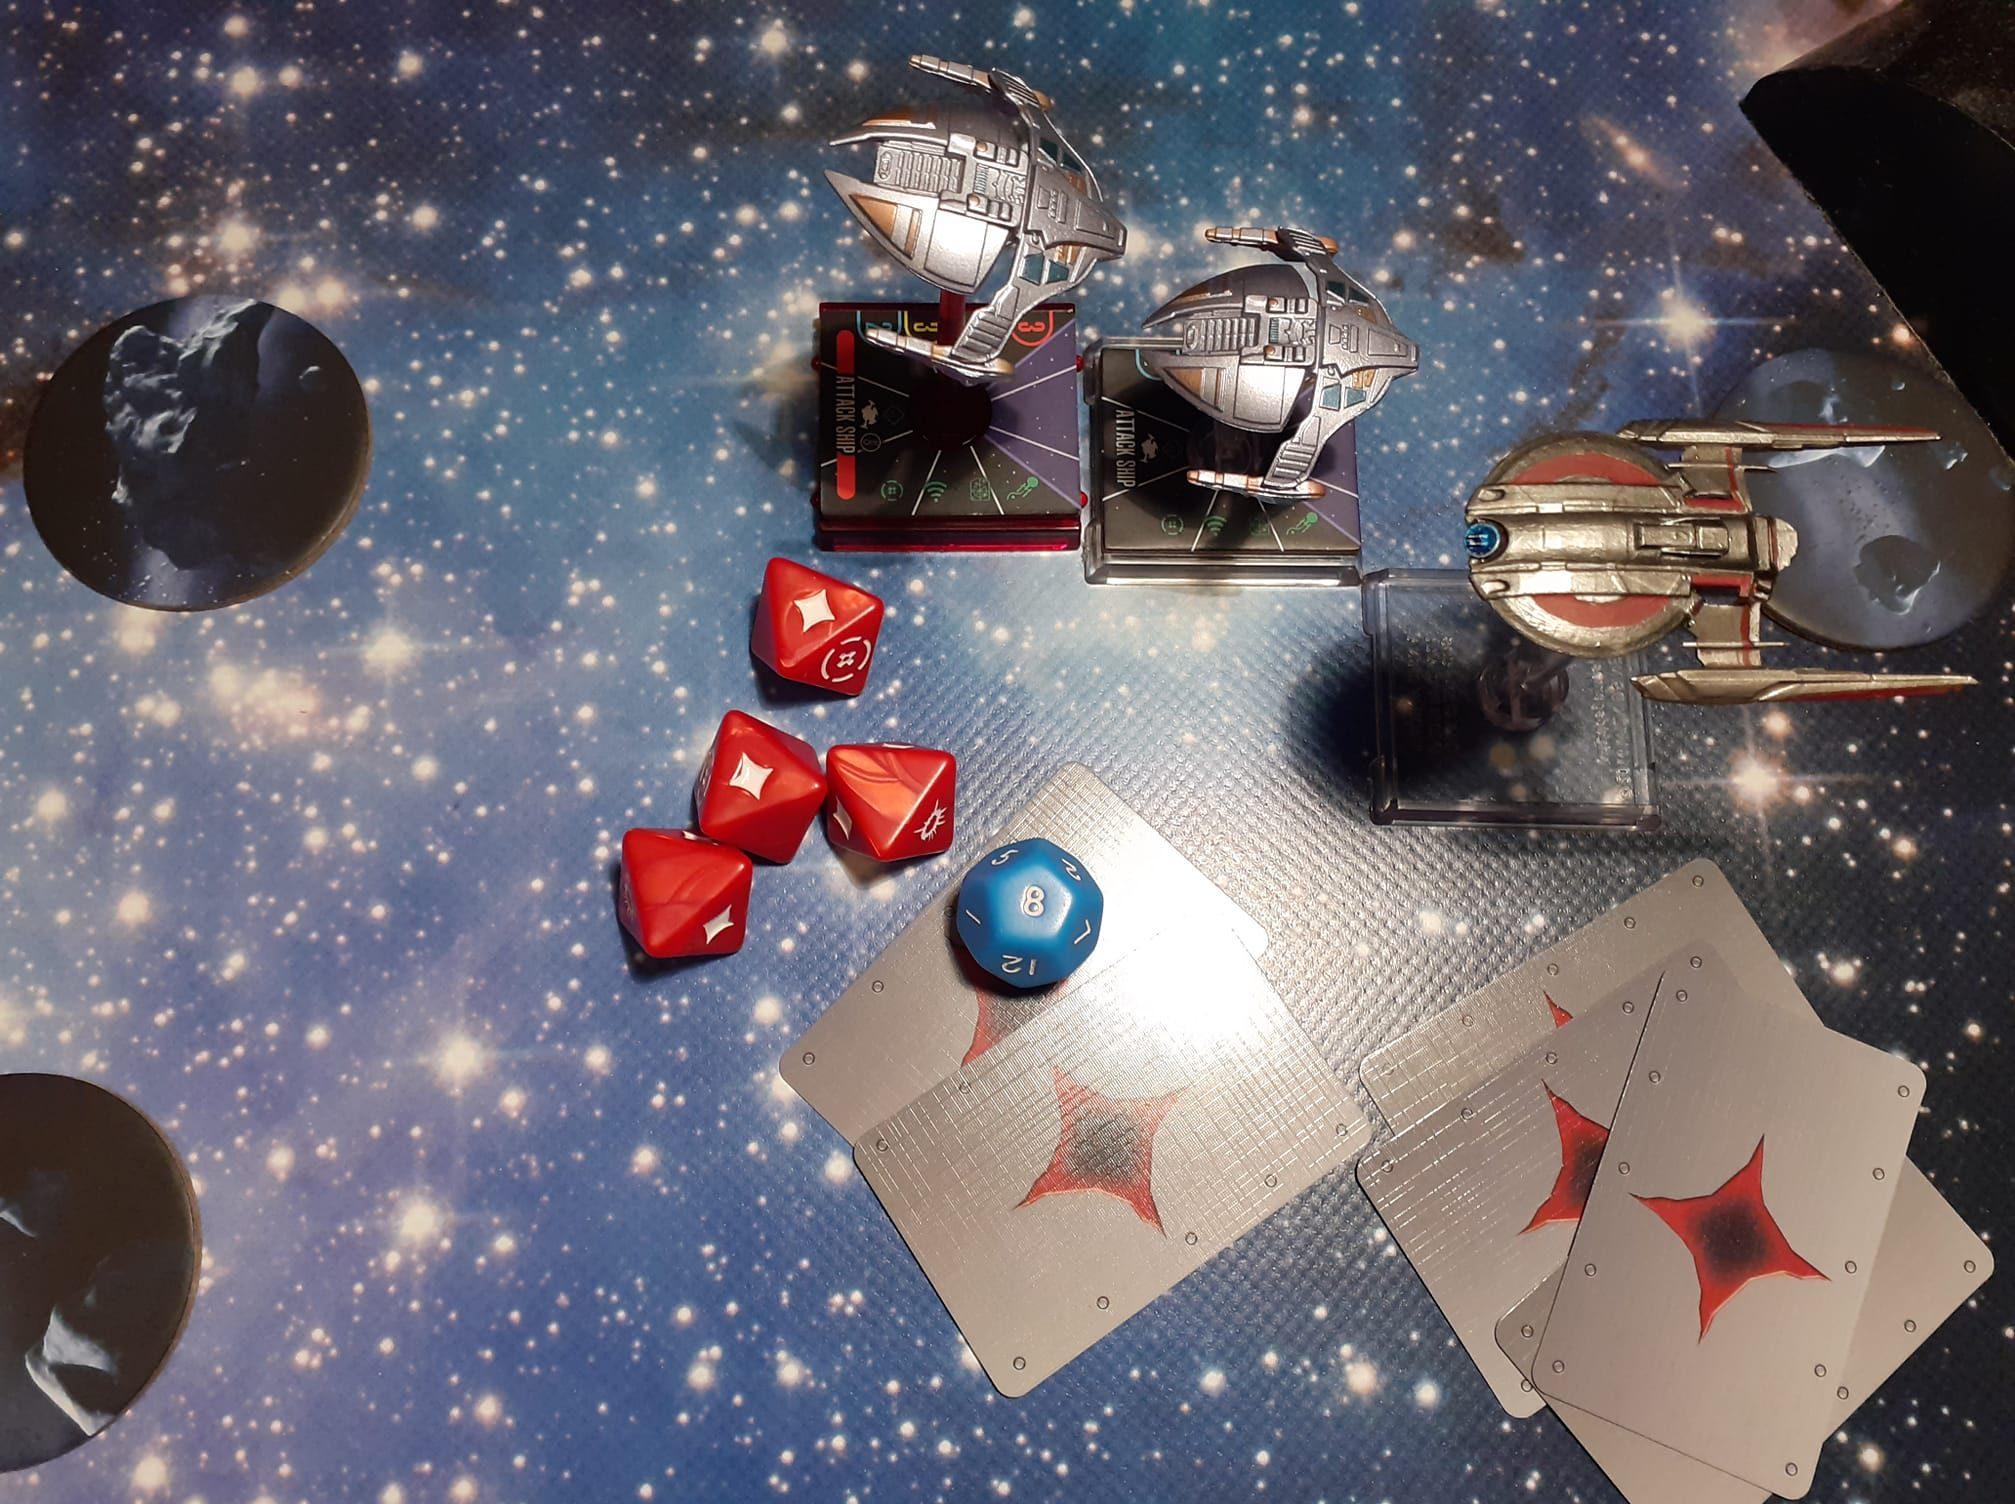 [Star Trek Alliance - Dominion War Campaign I] Computerlogbuch der Solo-Kampagne von Commander Cut  159894855_10223974461566399_3979407823397488330_o-e1615645797222